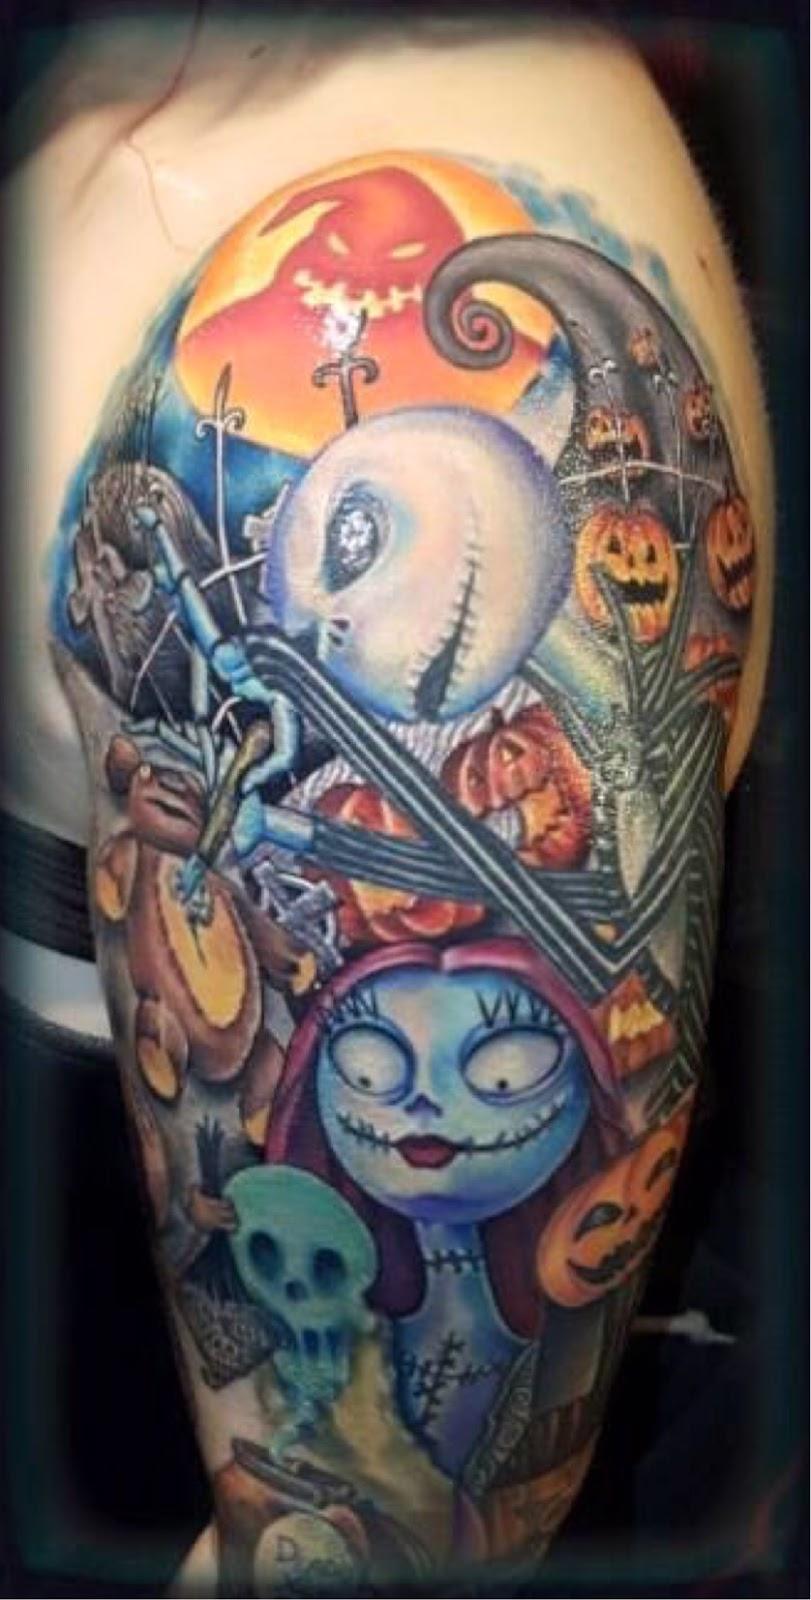 Eternal Wynter: Nightmare Before Christmas tattoo!